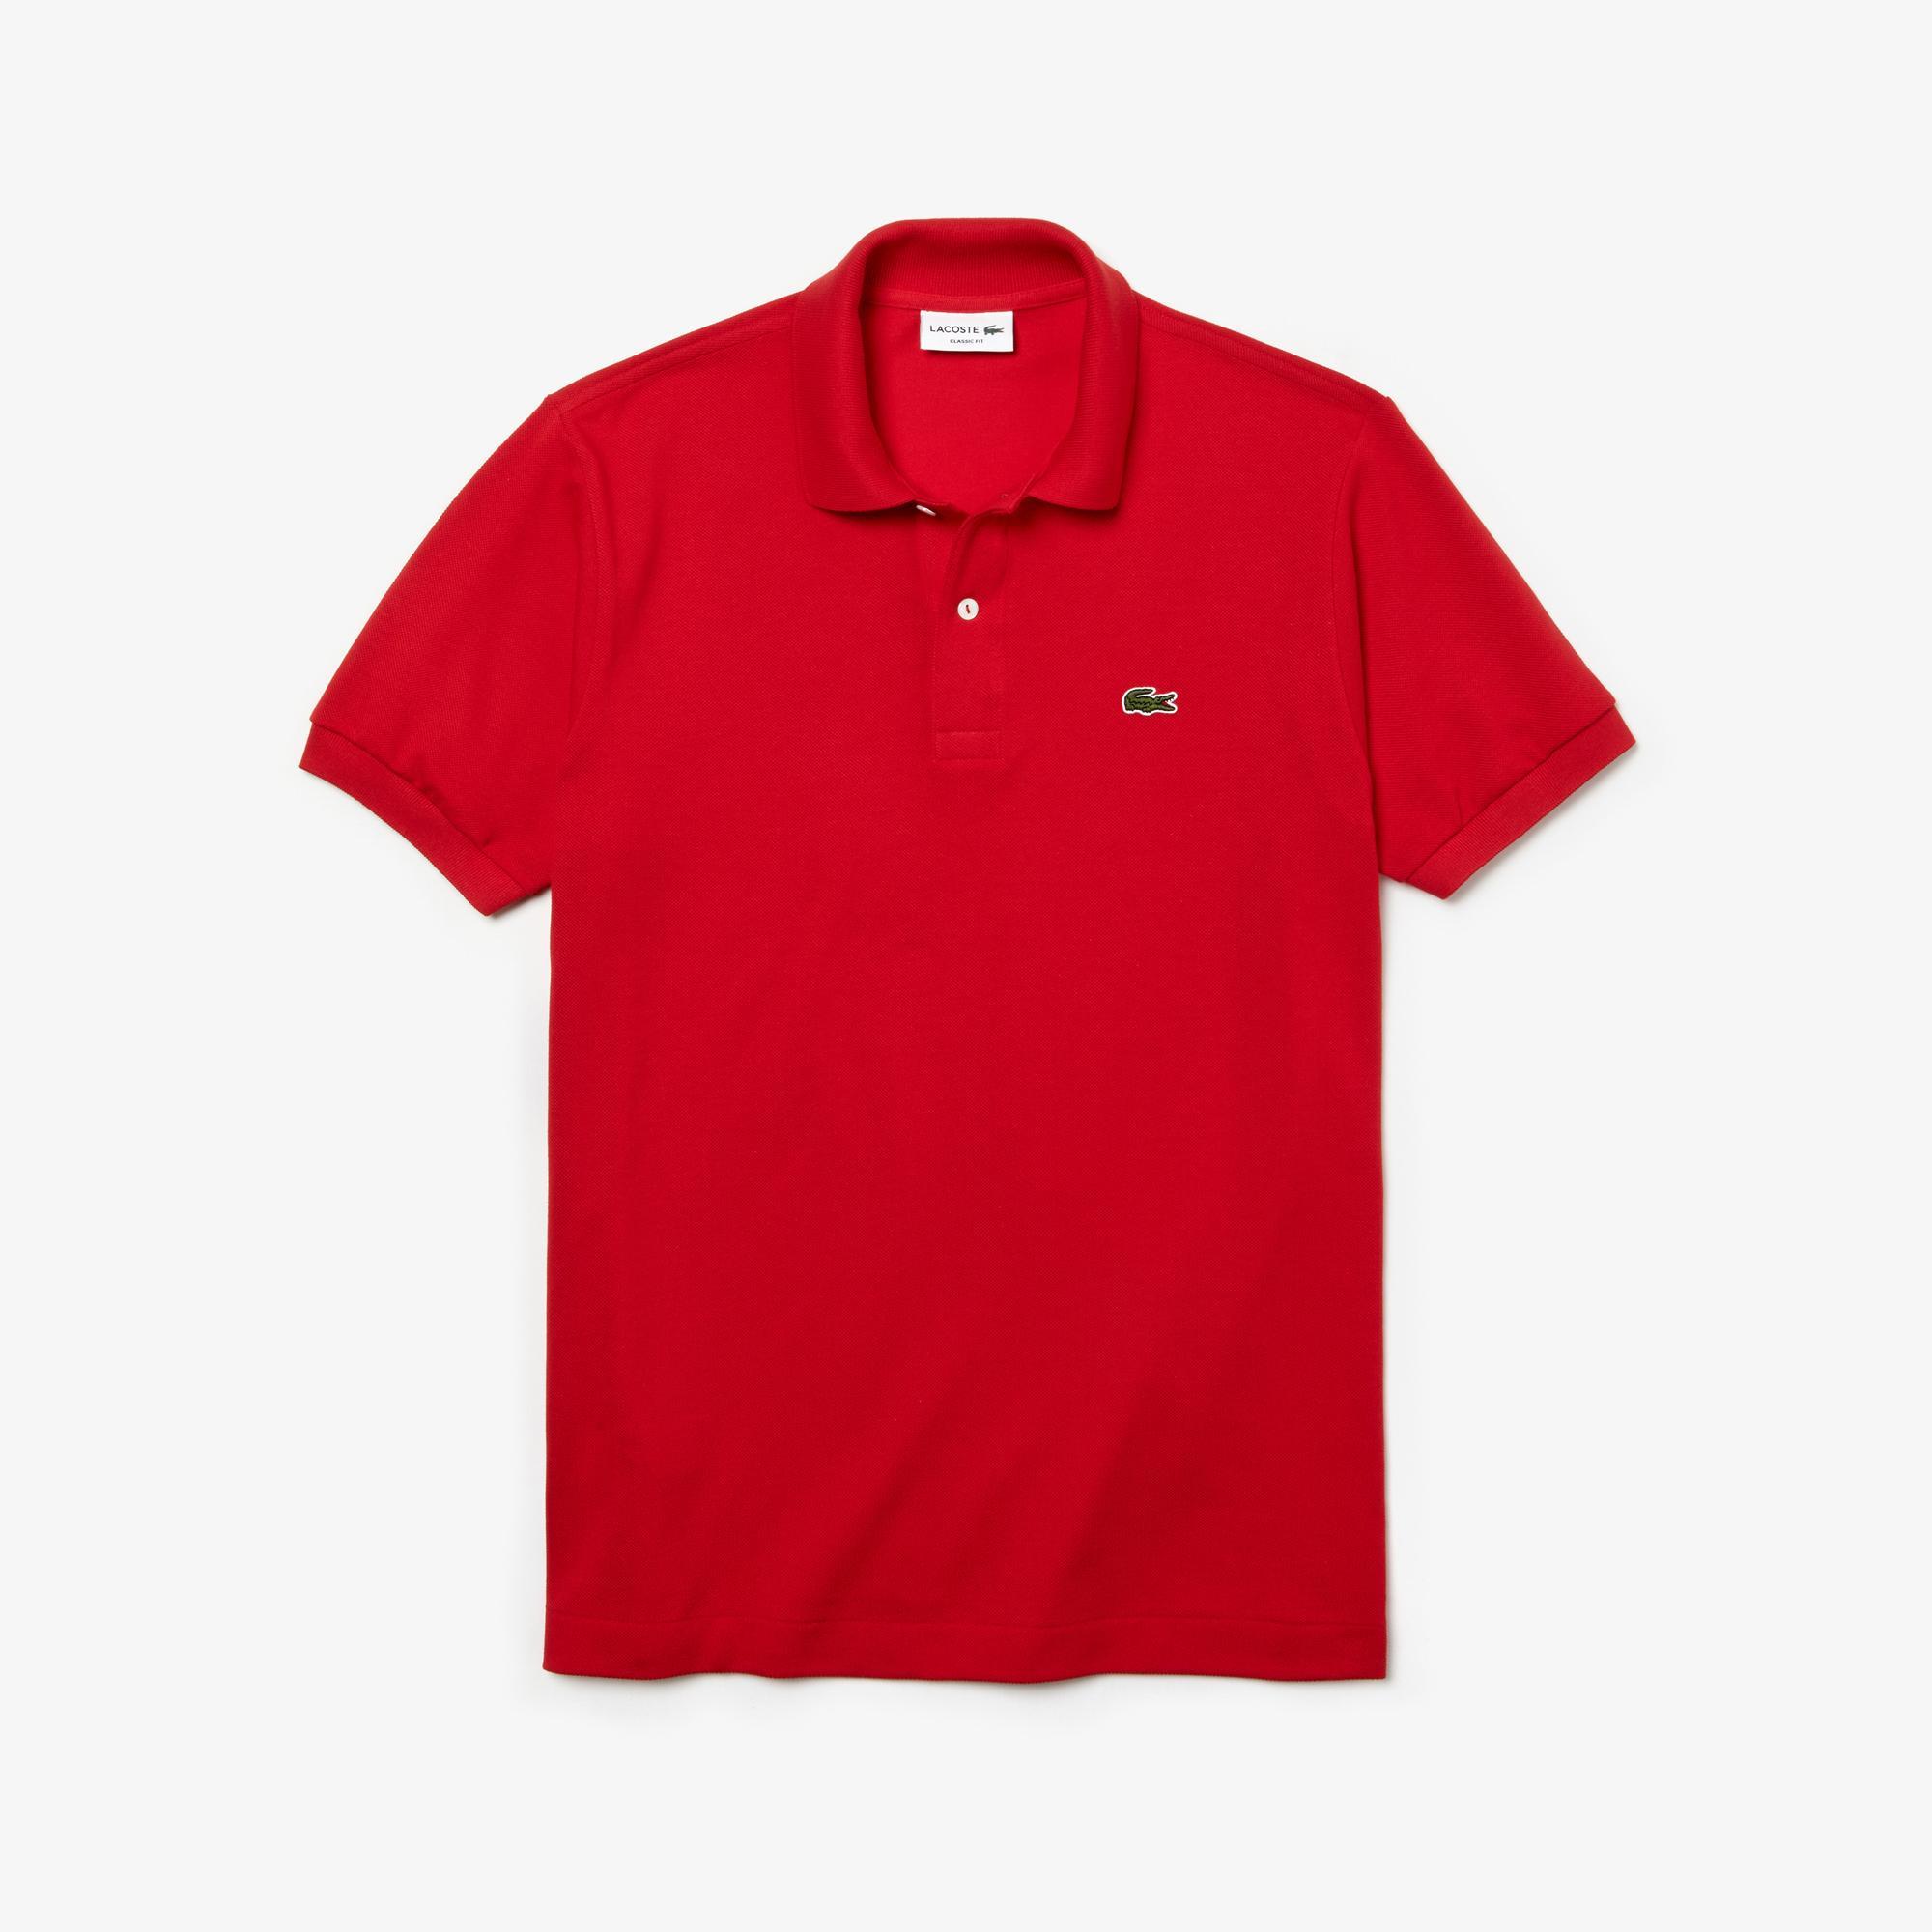 Lacoste Erkek Klasik Fit L1212 Kırmızı Polo